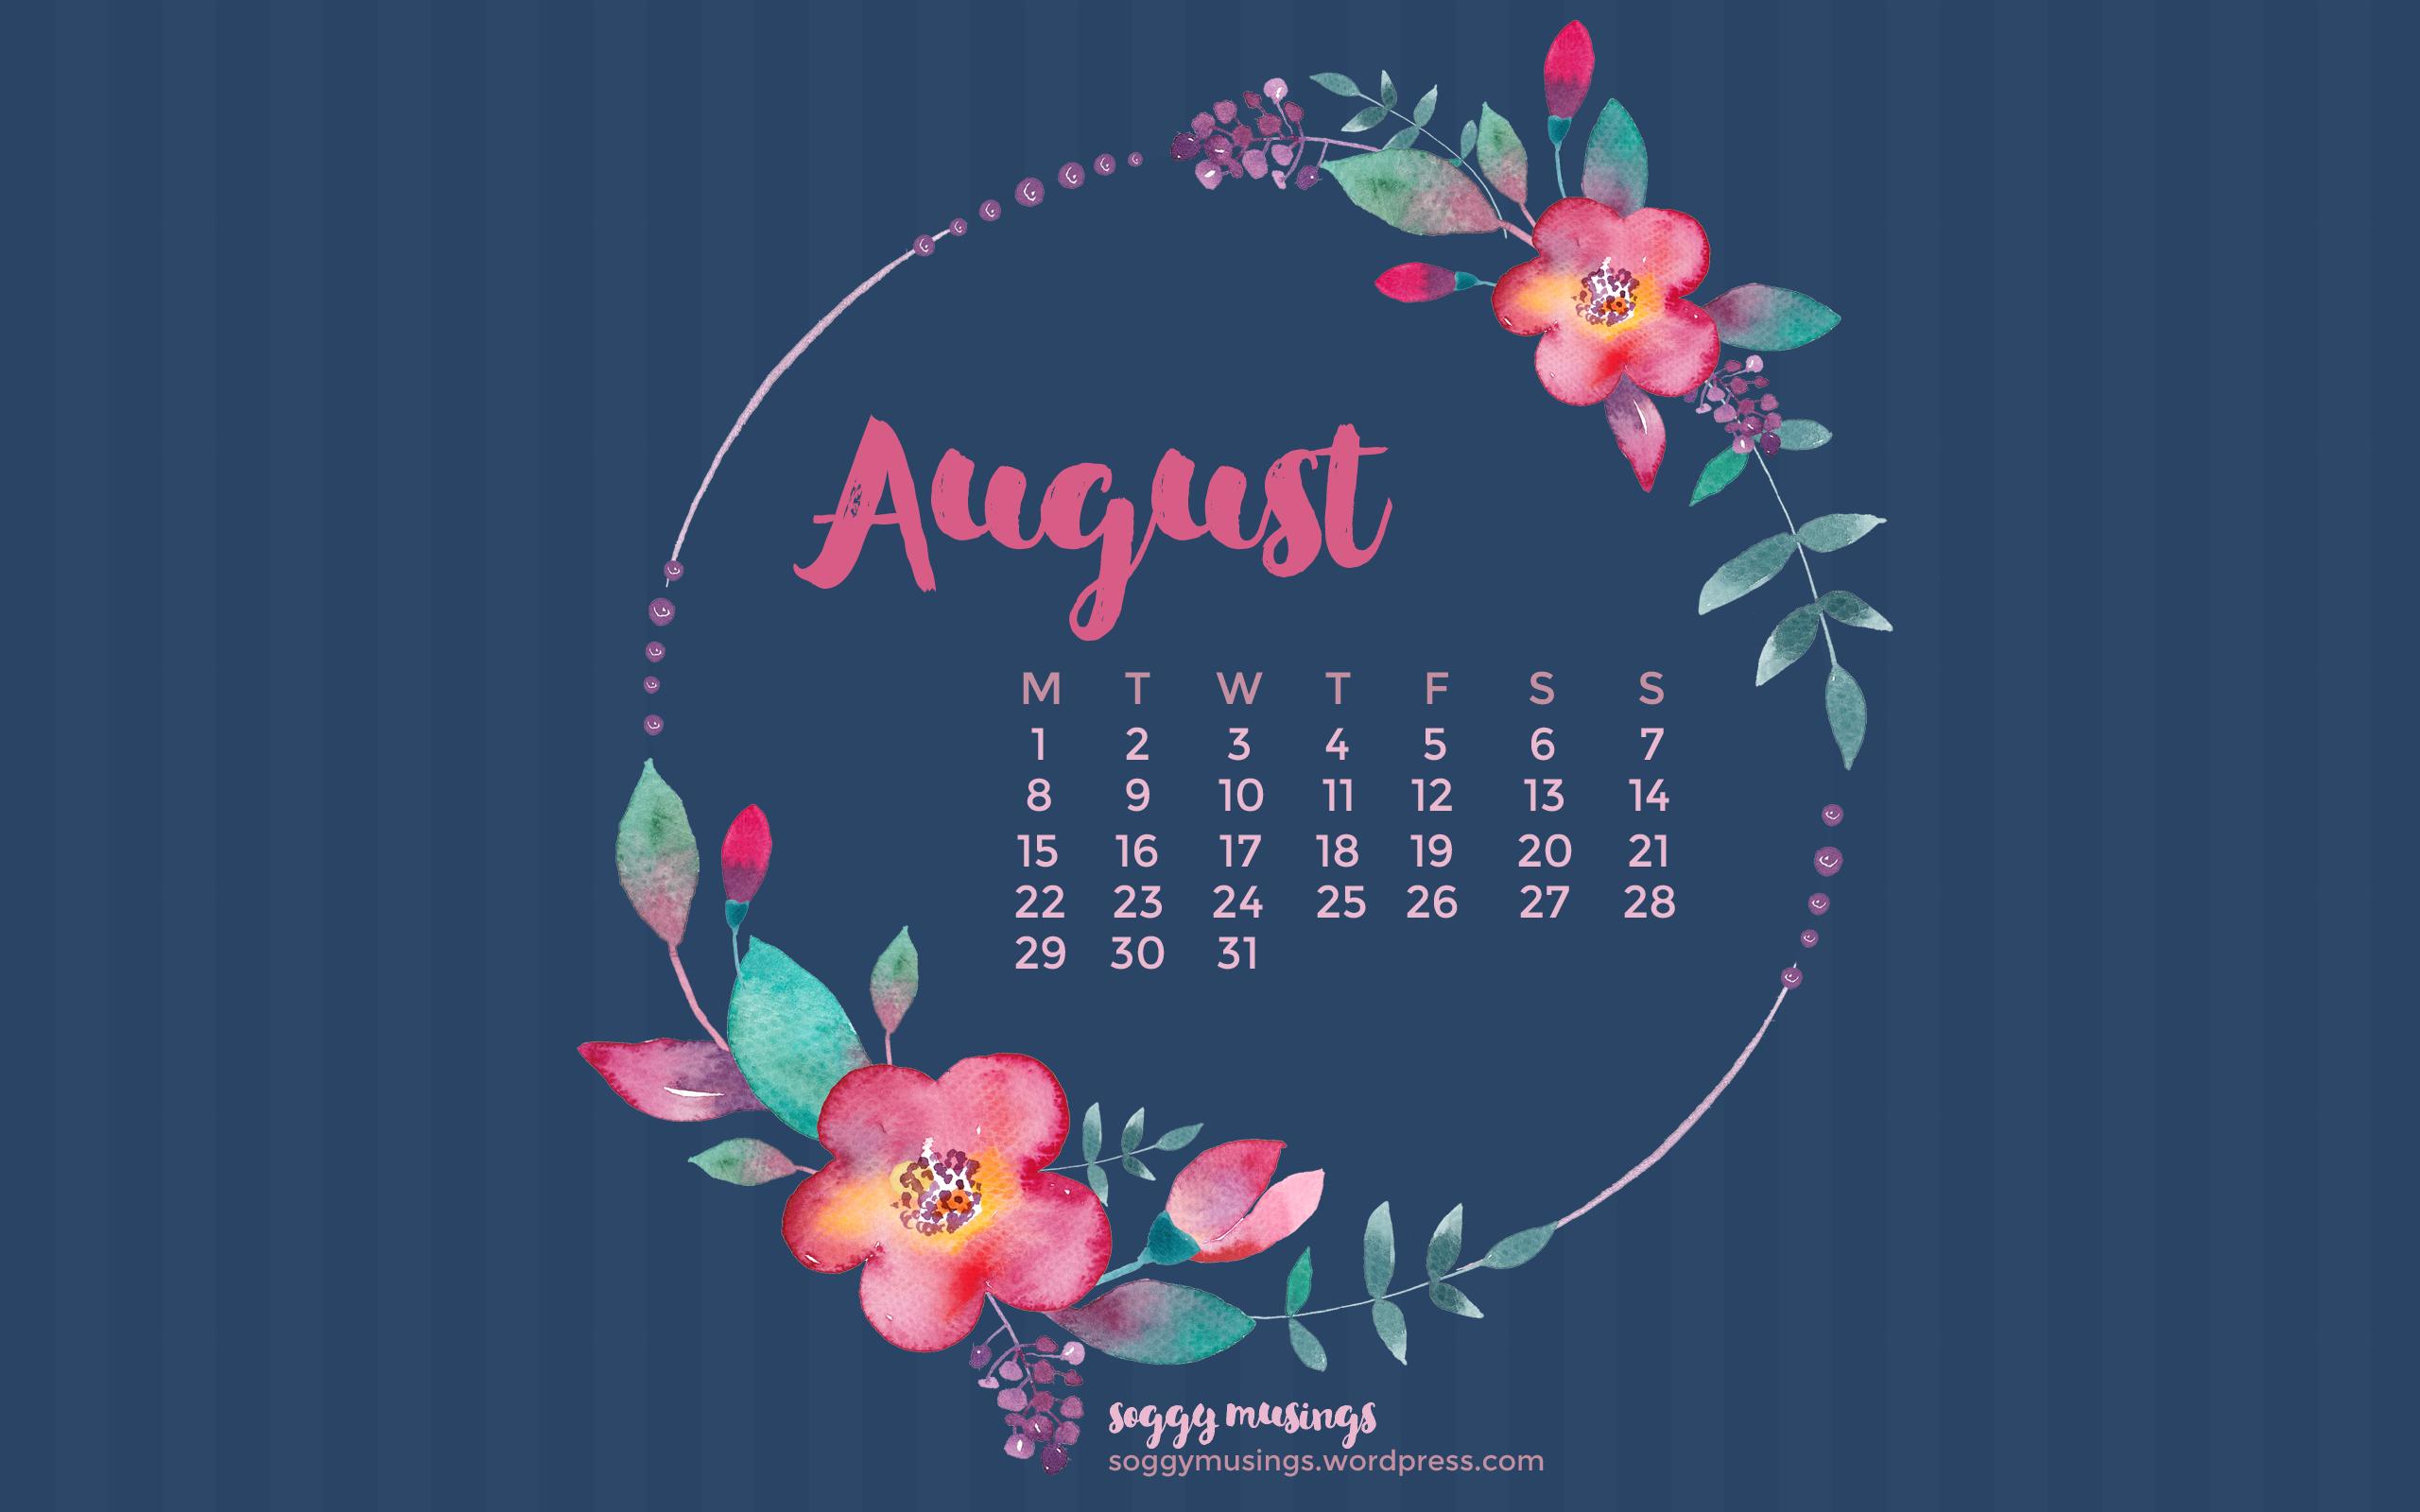 August 2016 Wallpaper Calendar – soggy musings